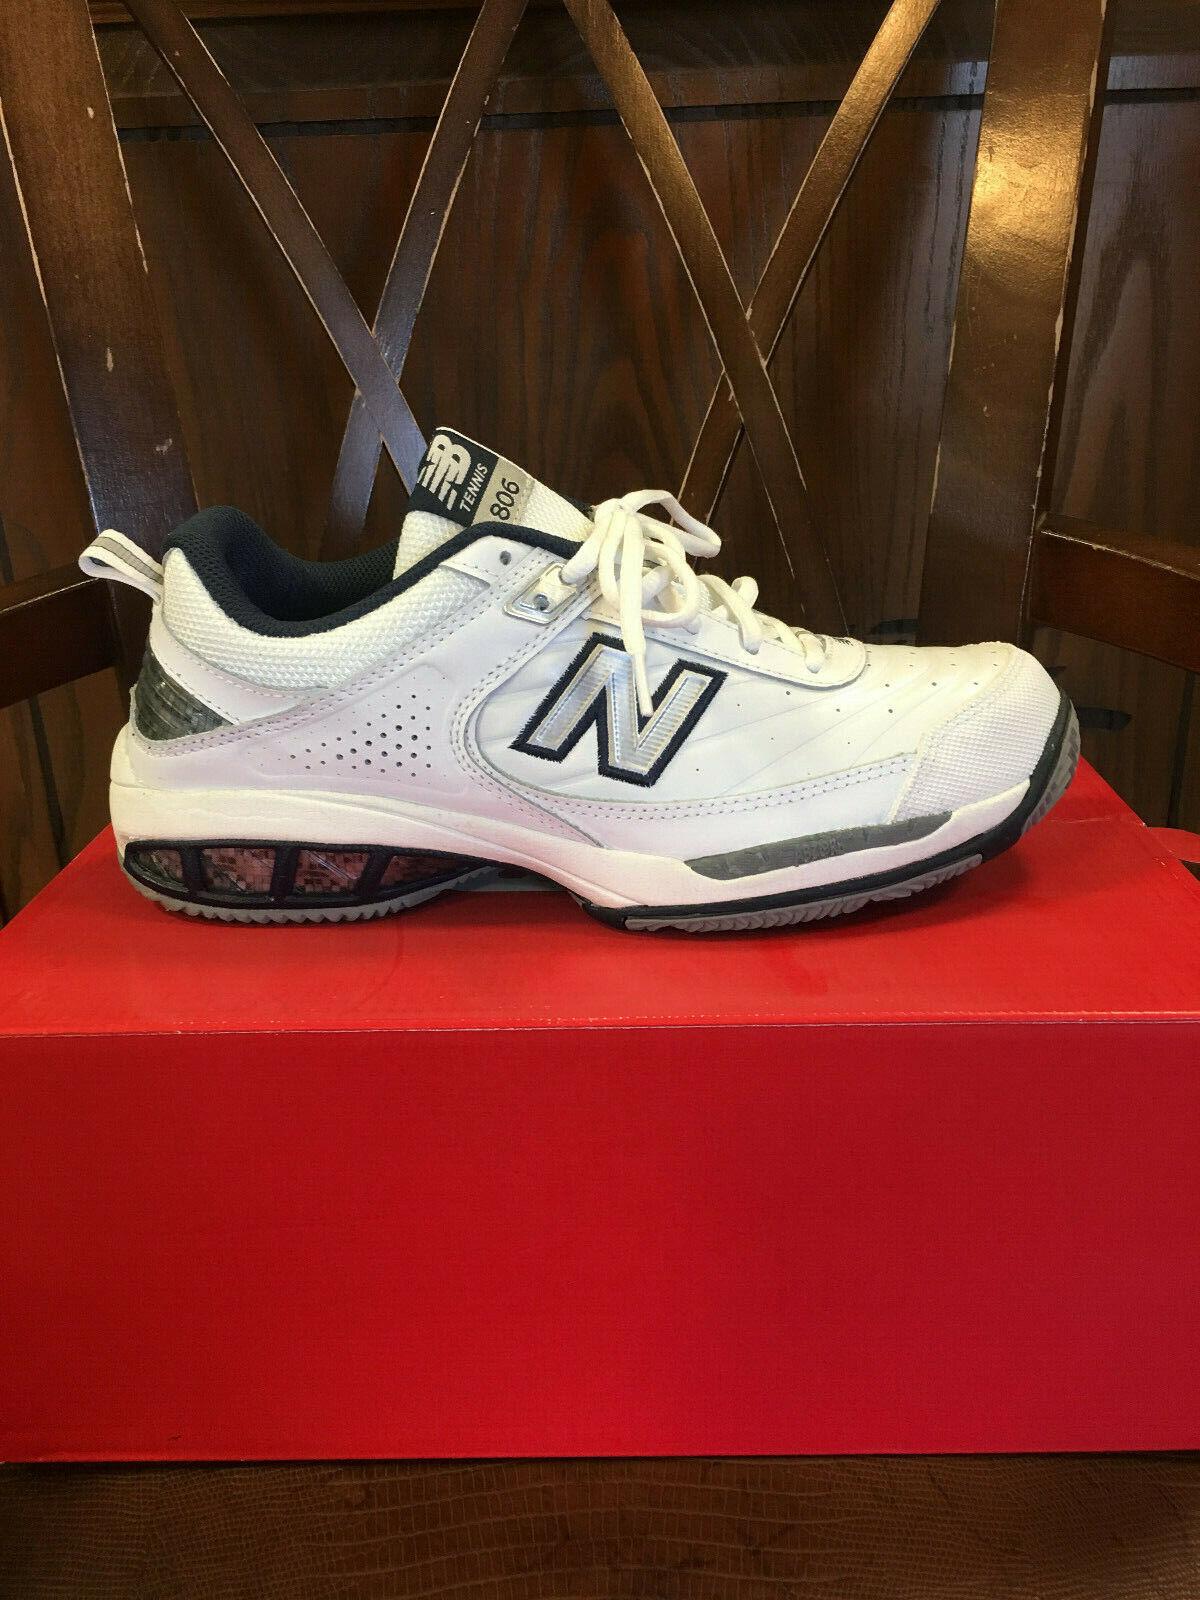 Para Hombre MC806W Ancho. para Hombre NEW BALANCE Zapatos tenis de ancho.  totalmente Nuevo  varios tamaños